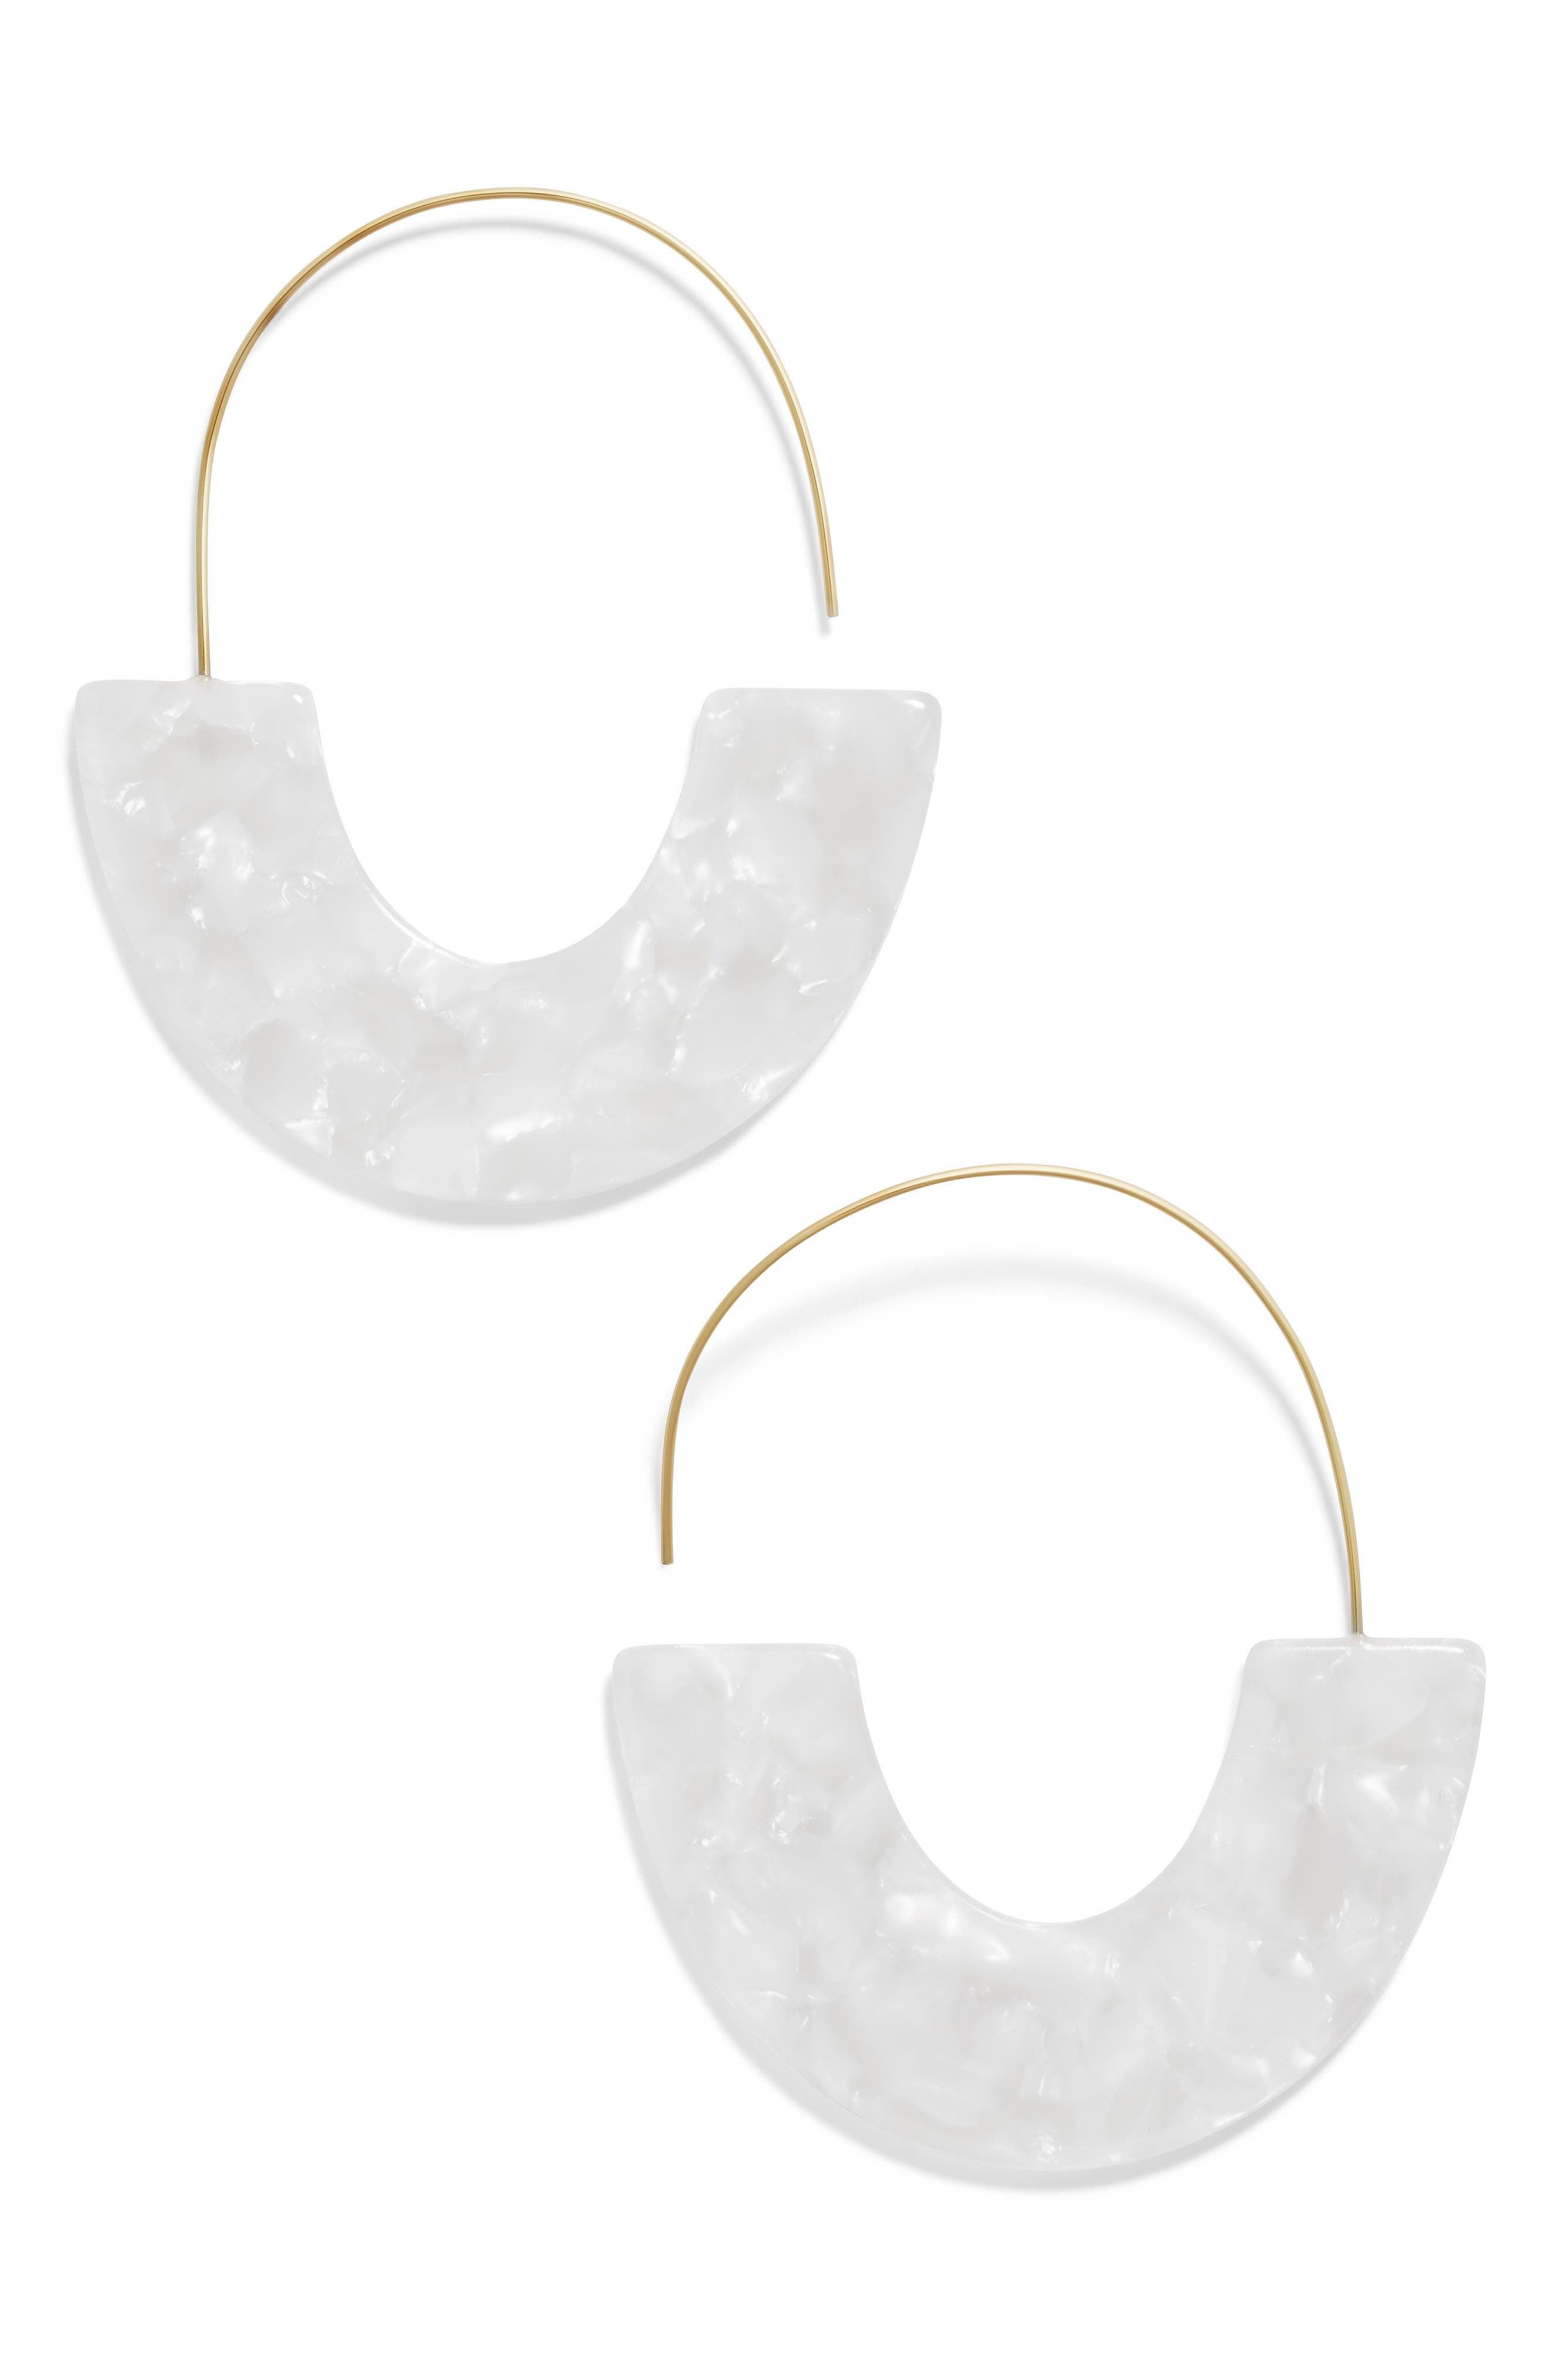 BAUBLEBAR Faidra Thin Drop Acrylic Oval Hoop Earrings in Cream